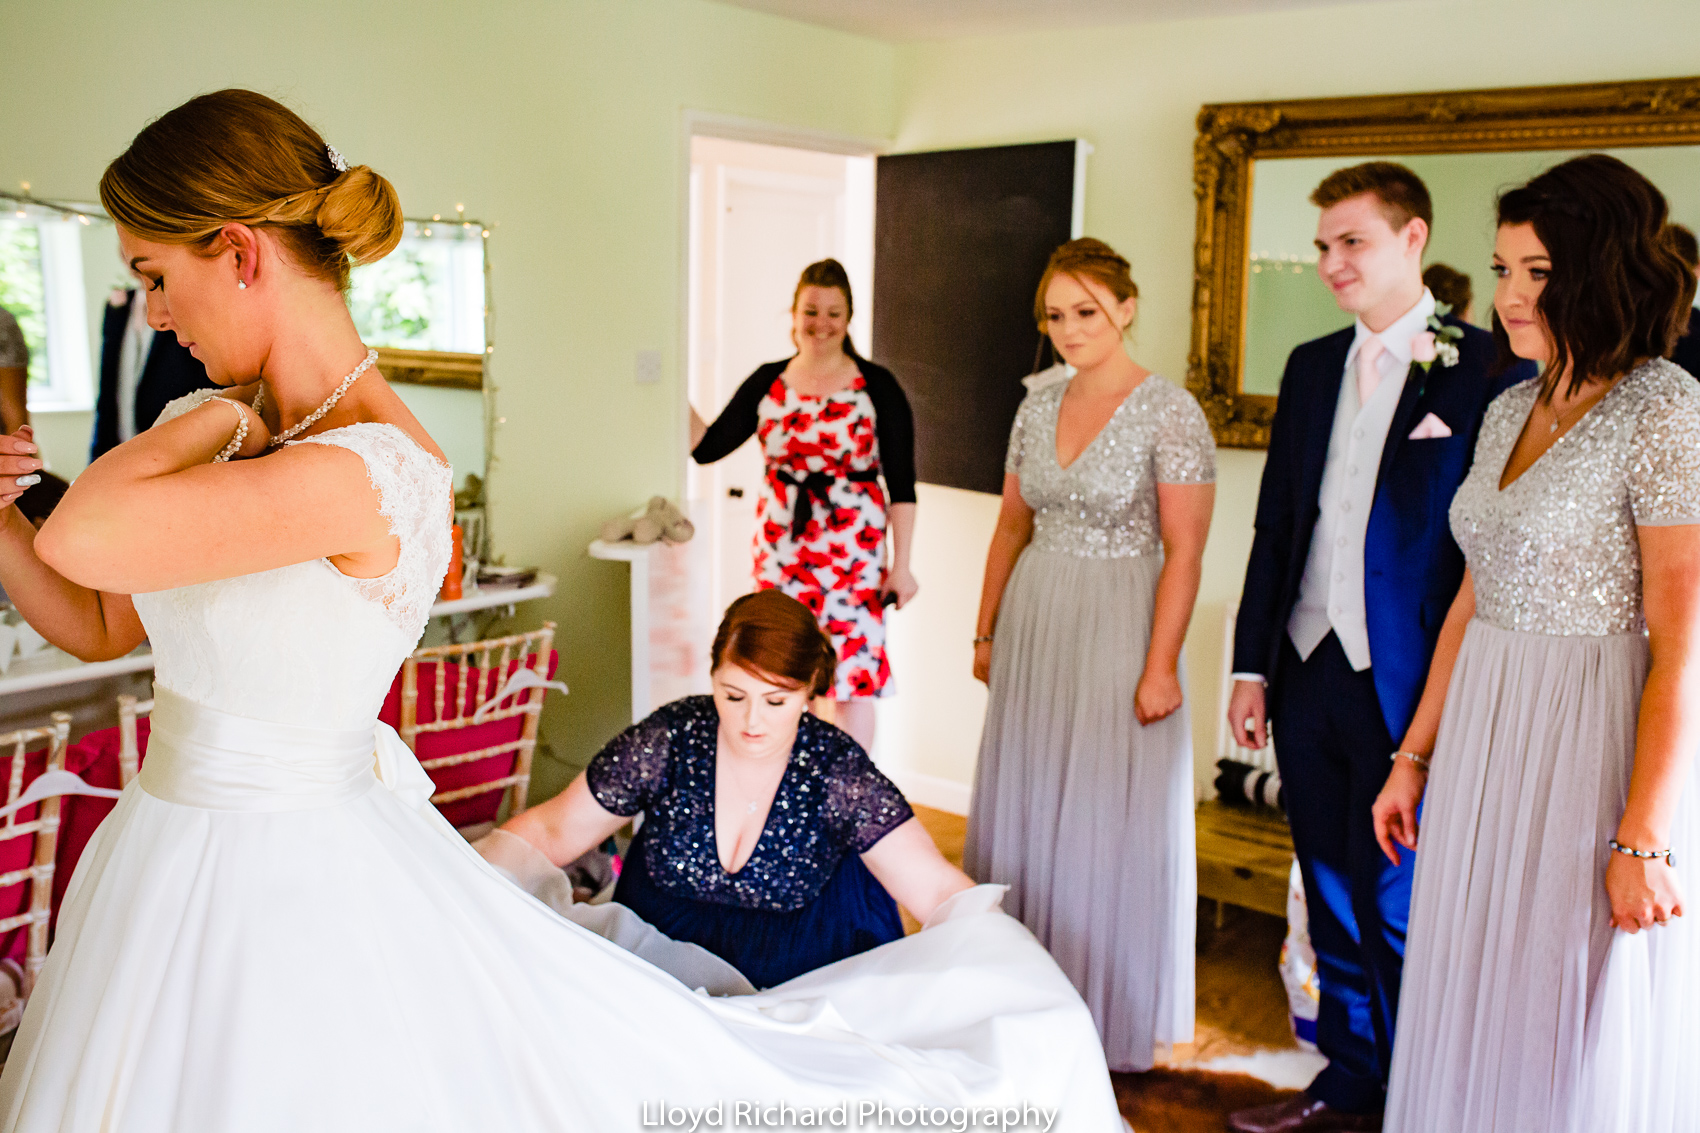 bridal party getting ready at Pitt Hall Barn